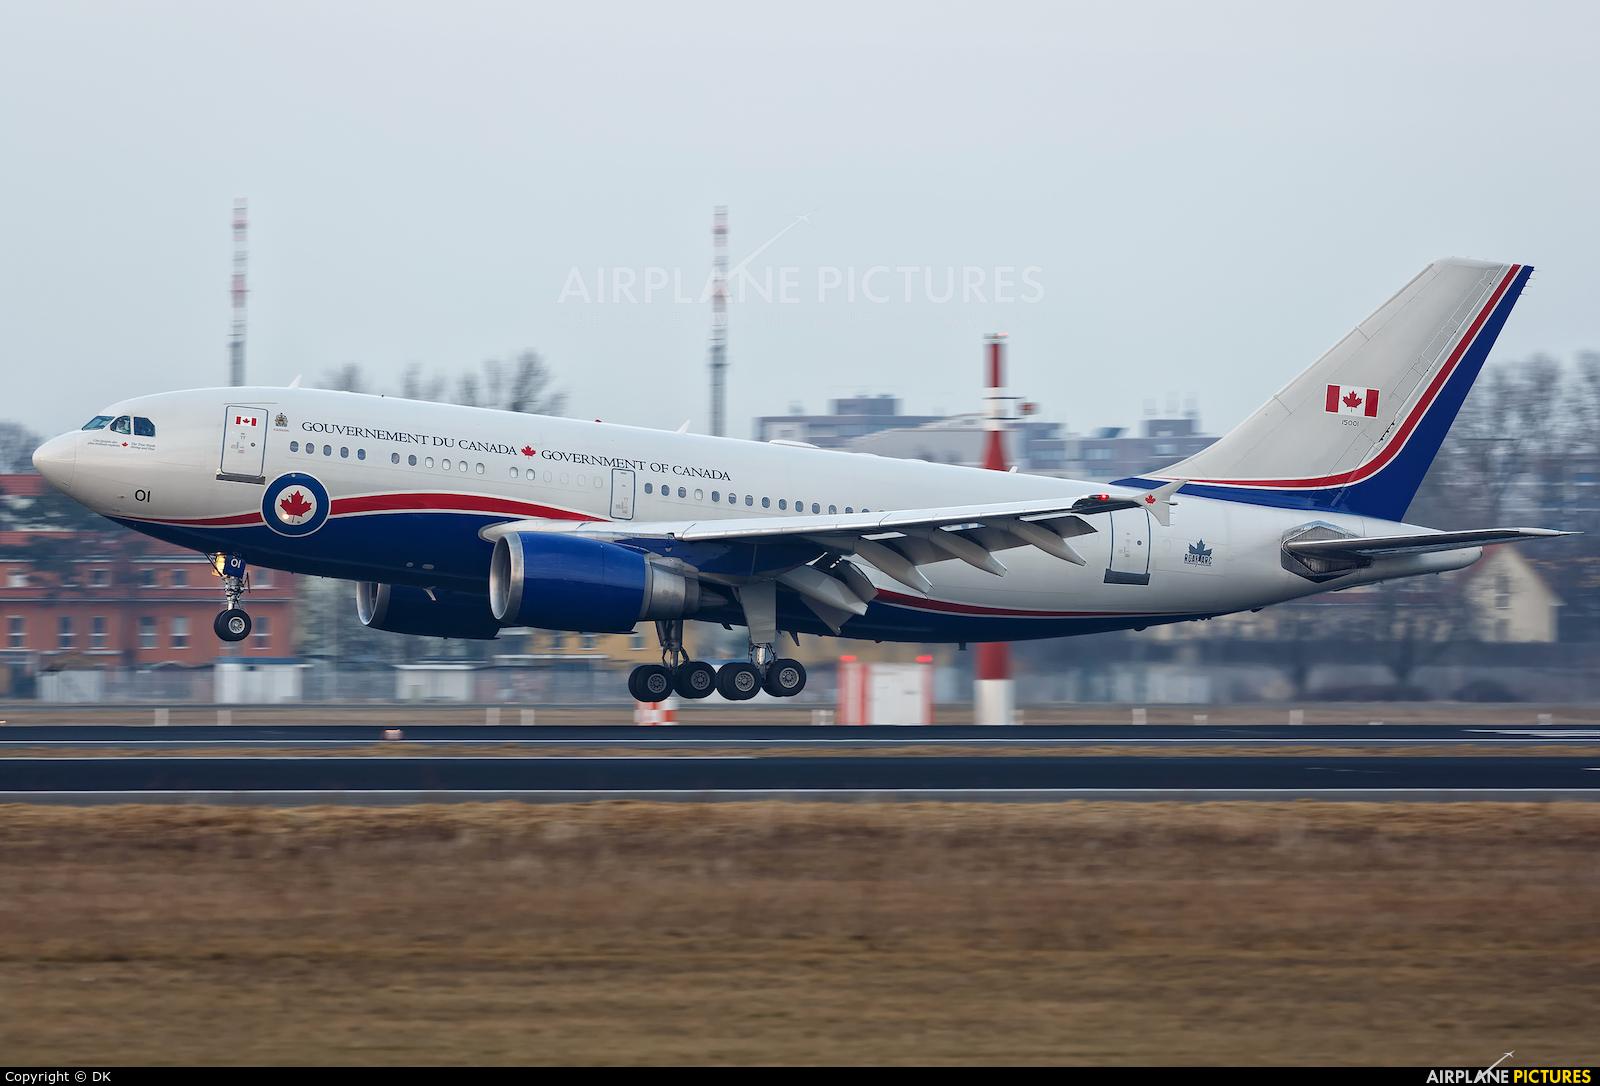 Canada - Air Force 15001 aircraft at Berlin - Tegel